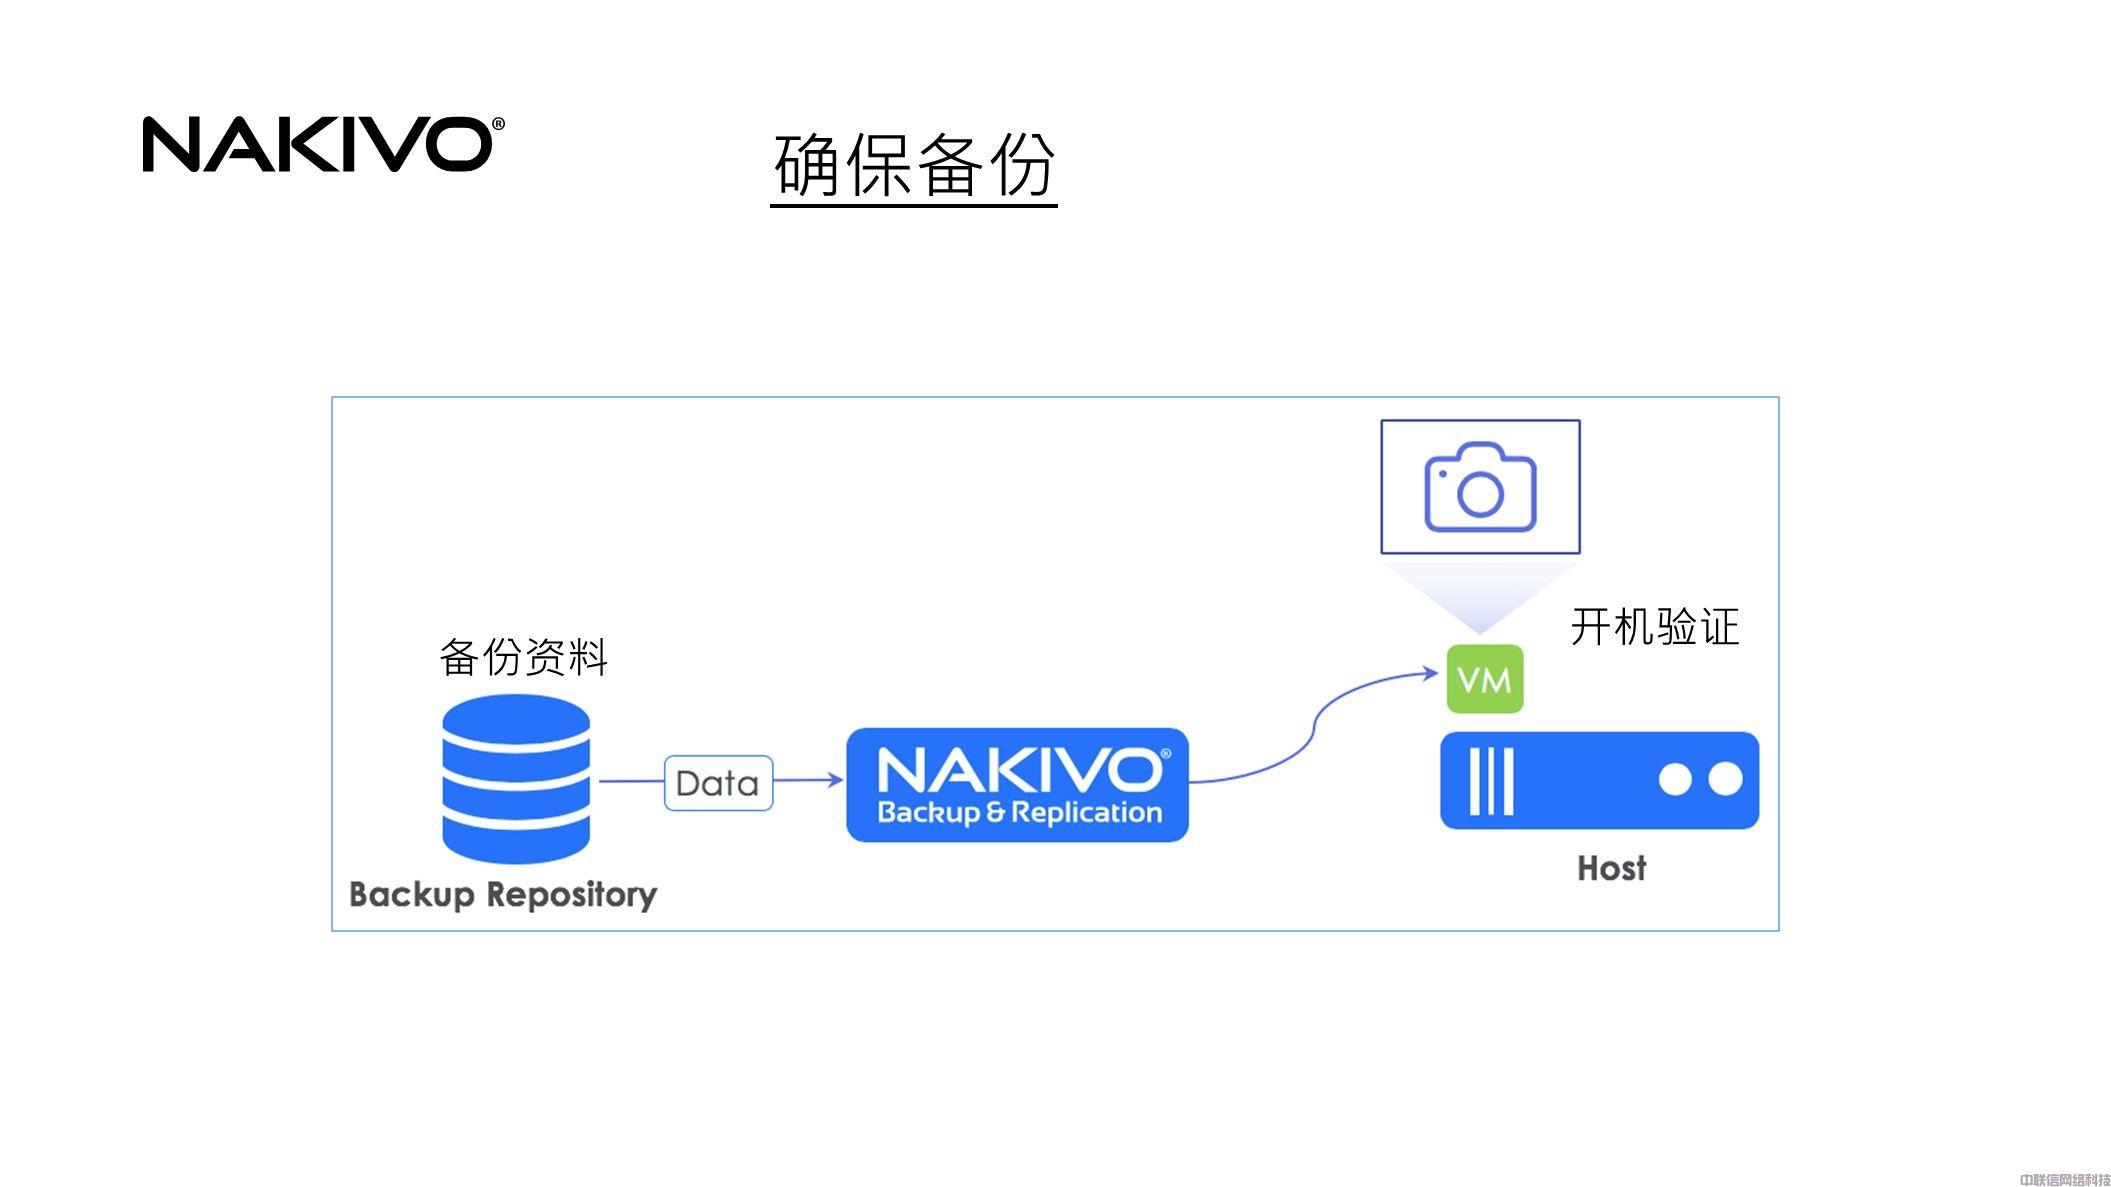 虚拟化备份方案NAKIVO Backup & Replication(图19)